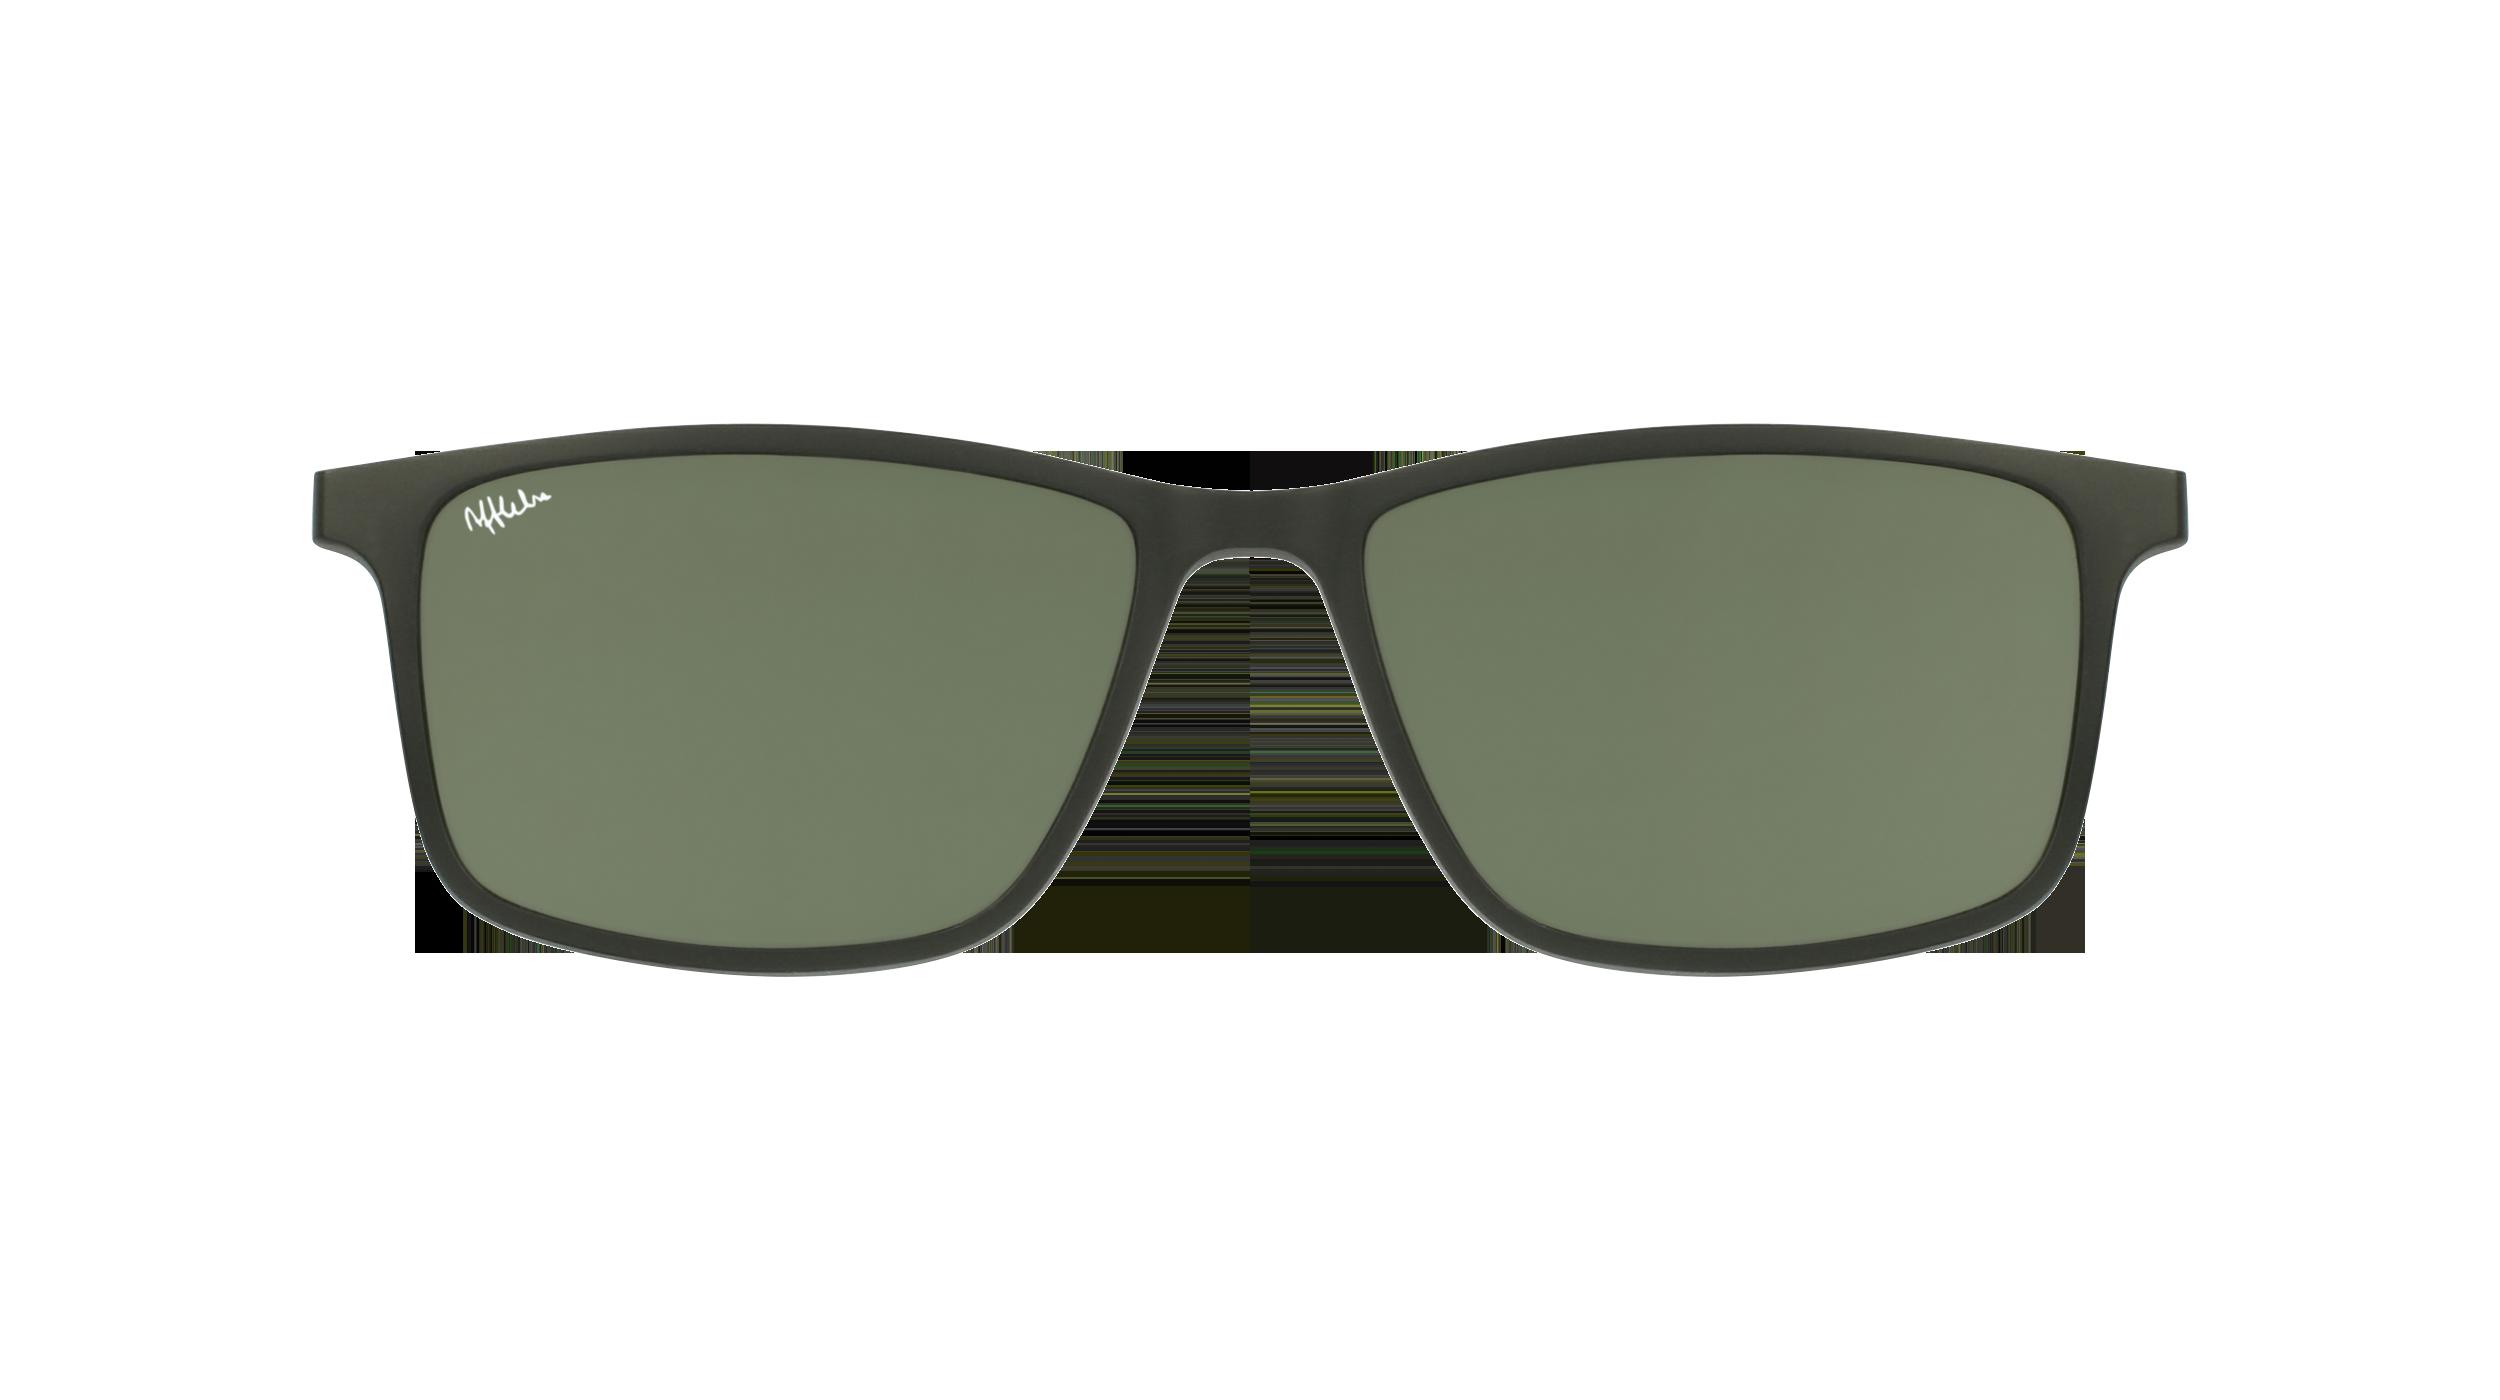 afflelou/france/products/smart_clip/clips_glasses/07630036456743.png